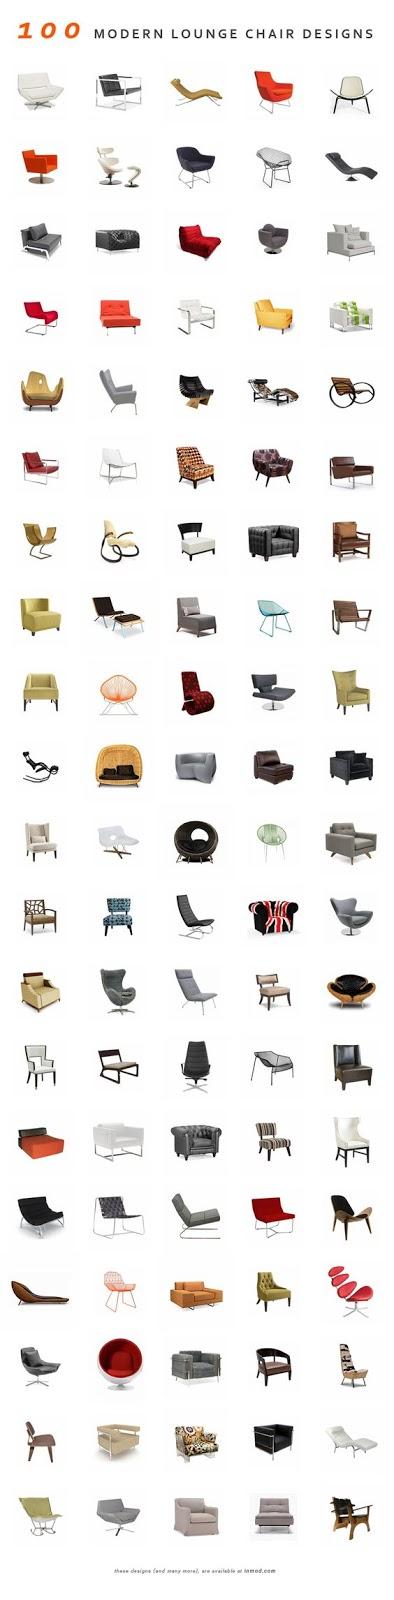 desain kursi cafe pilihan modern